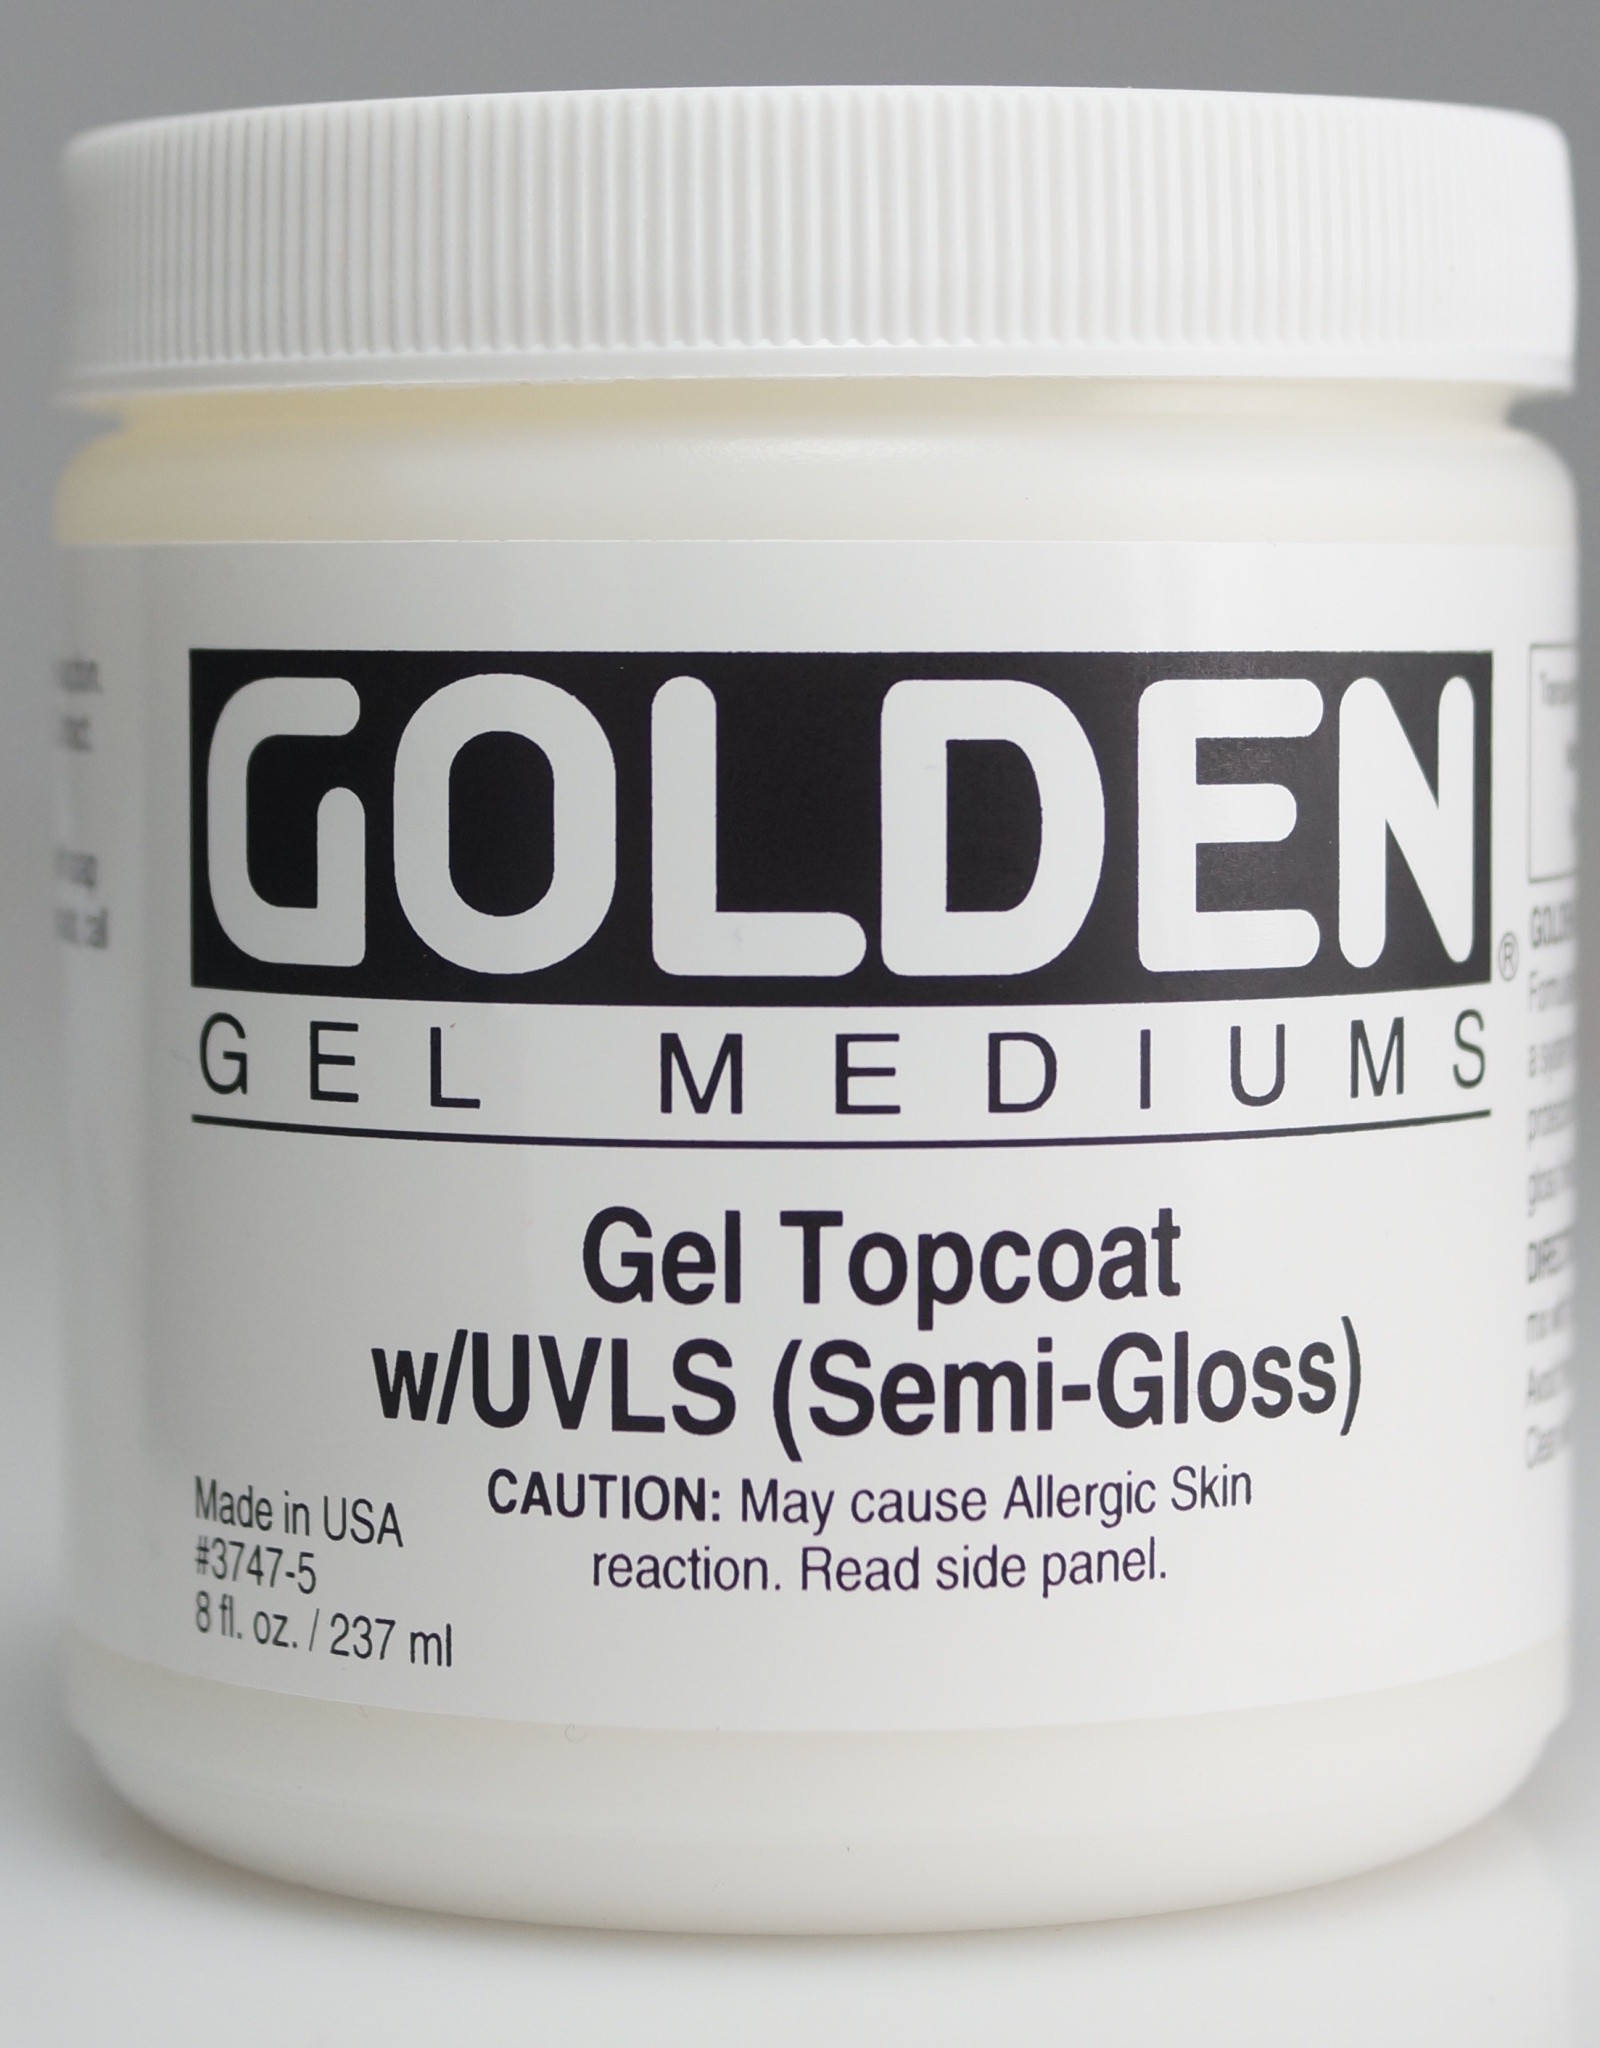 Golden, Medium, Gel Topcoat w/ UVLS, Semi-Gloss,  8 Fl Oz.